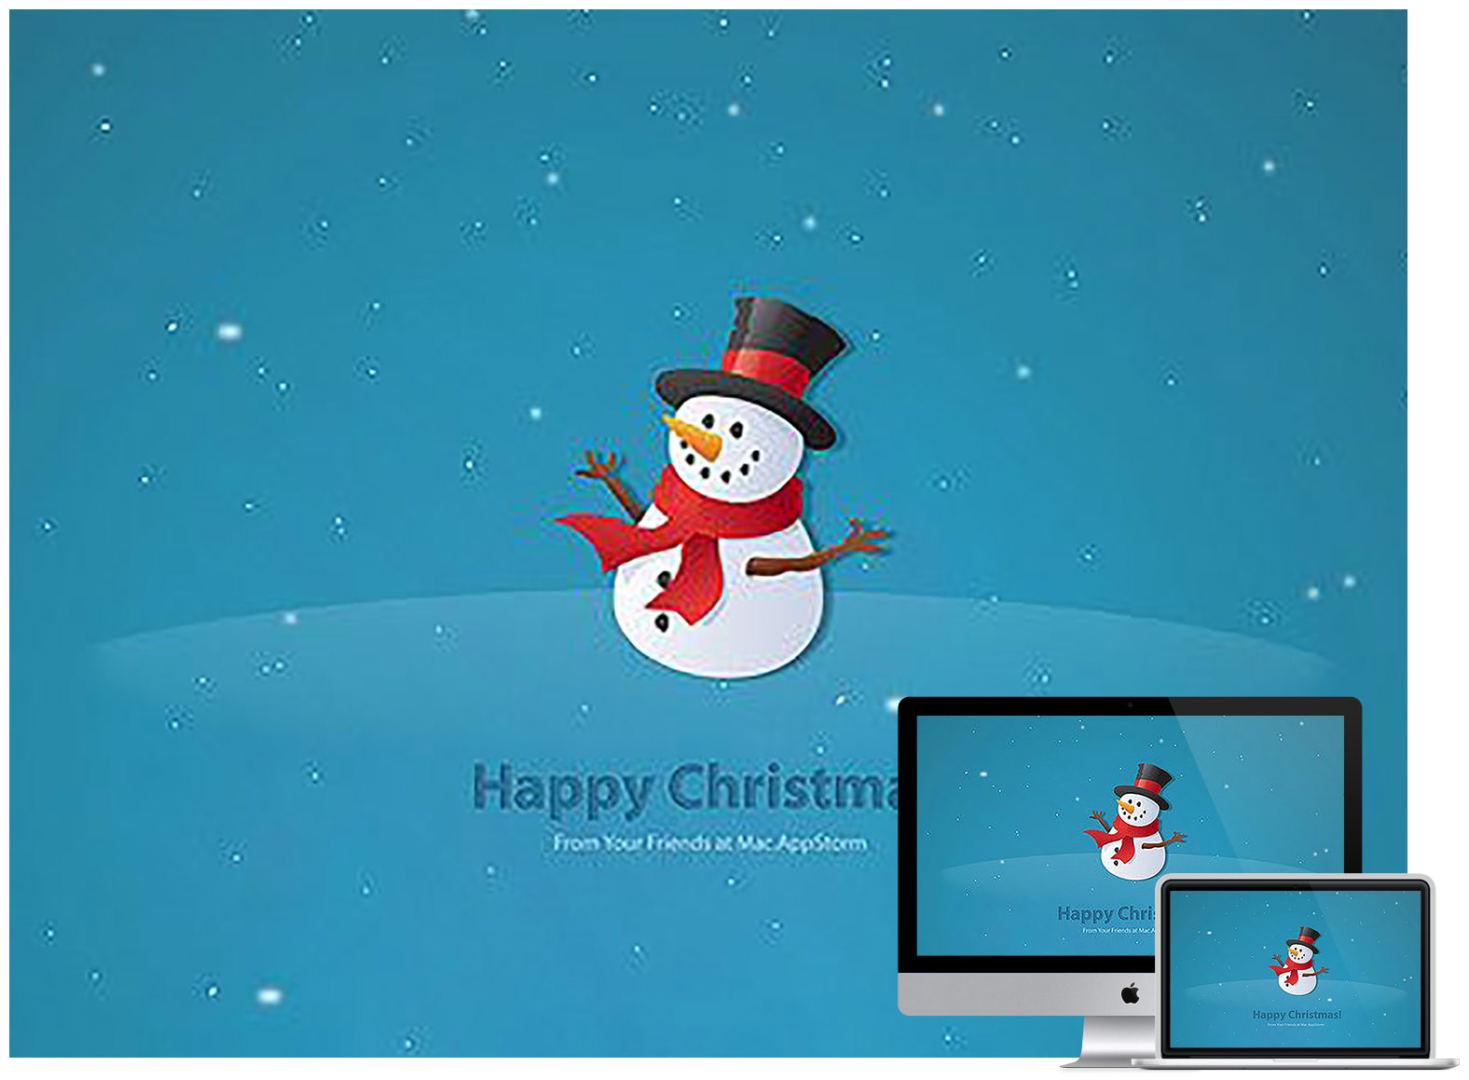 Christmas_wallpaper_blue